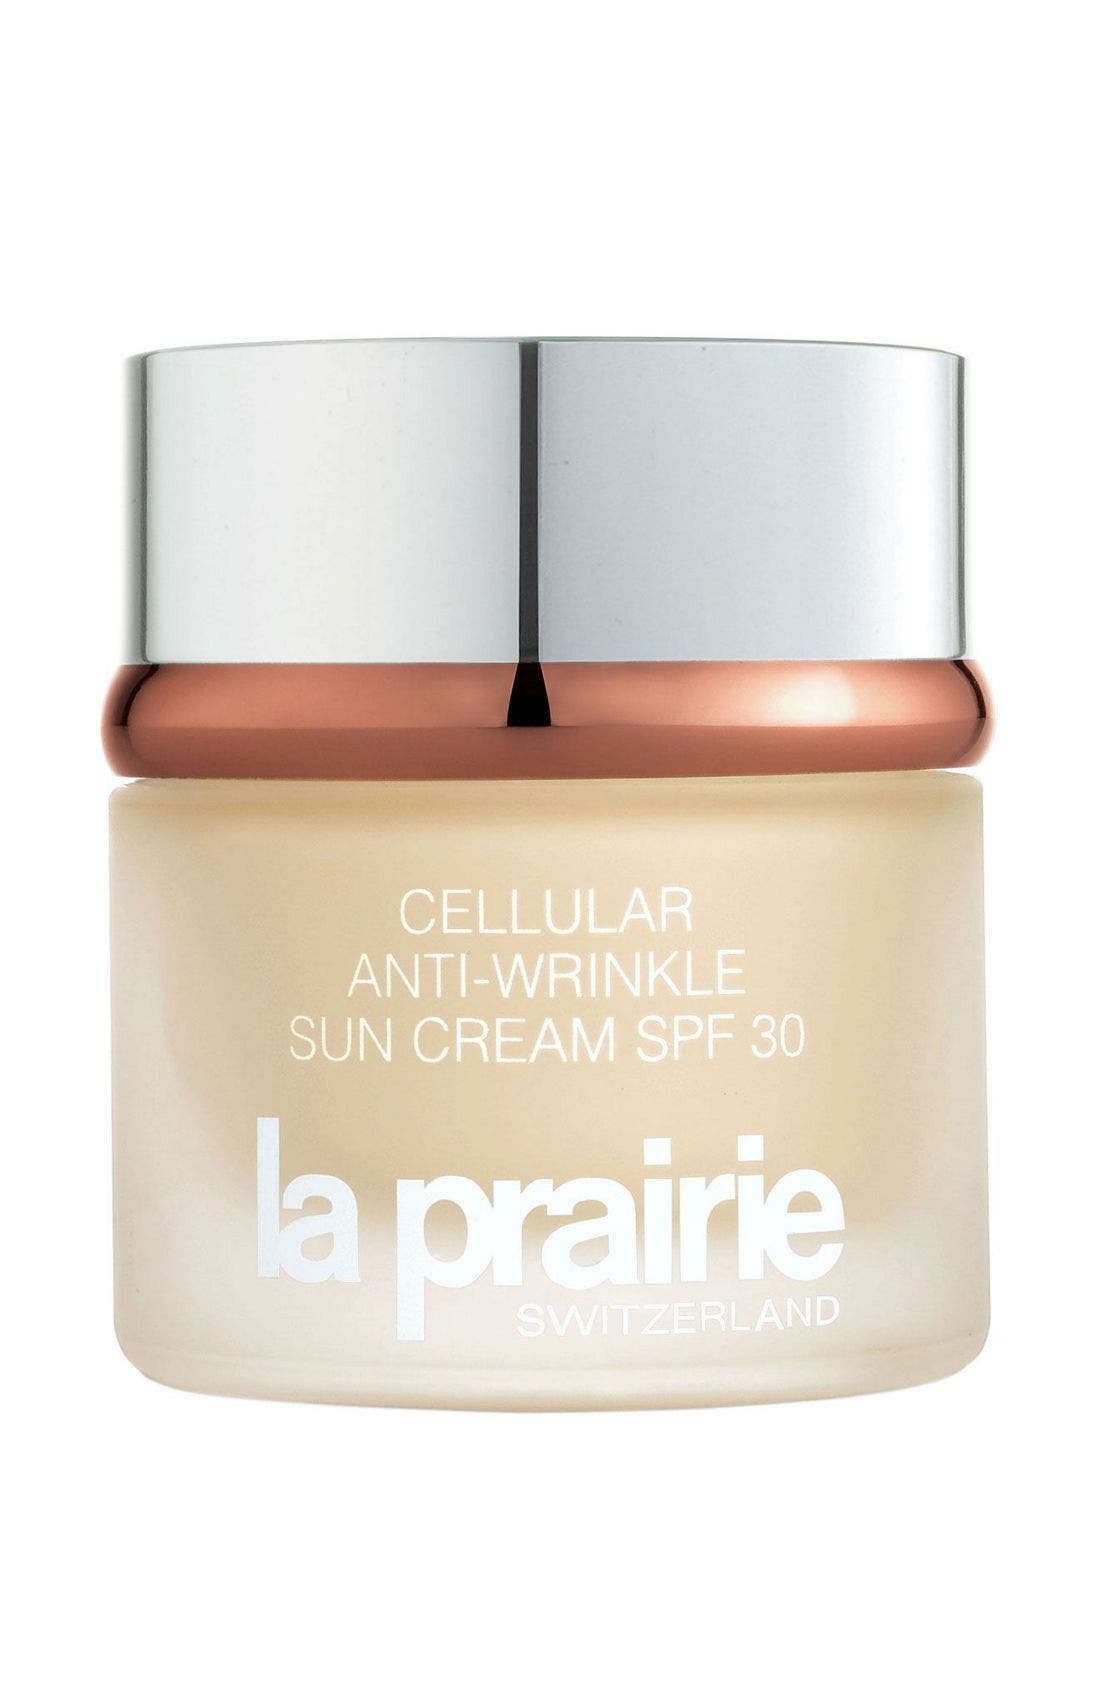 Cellular Anti-Wrinkle Sun Cream SPF 30,                             Main thumbnail 1, color,                             000